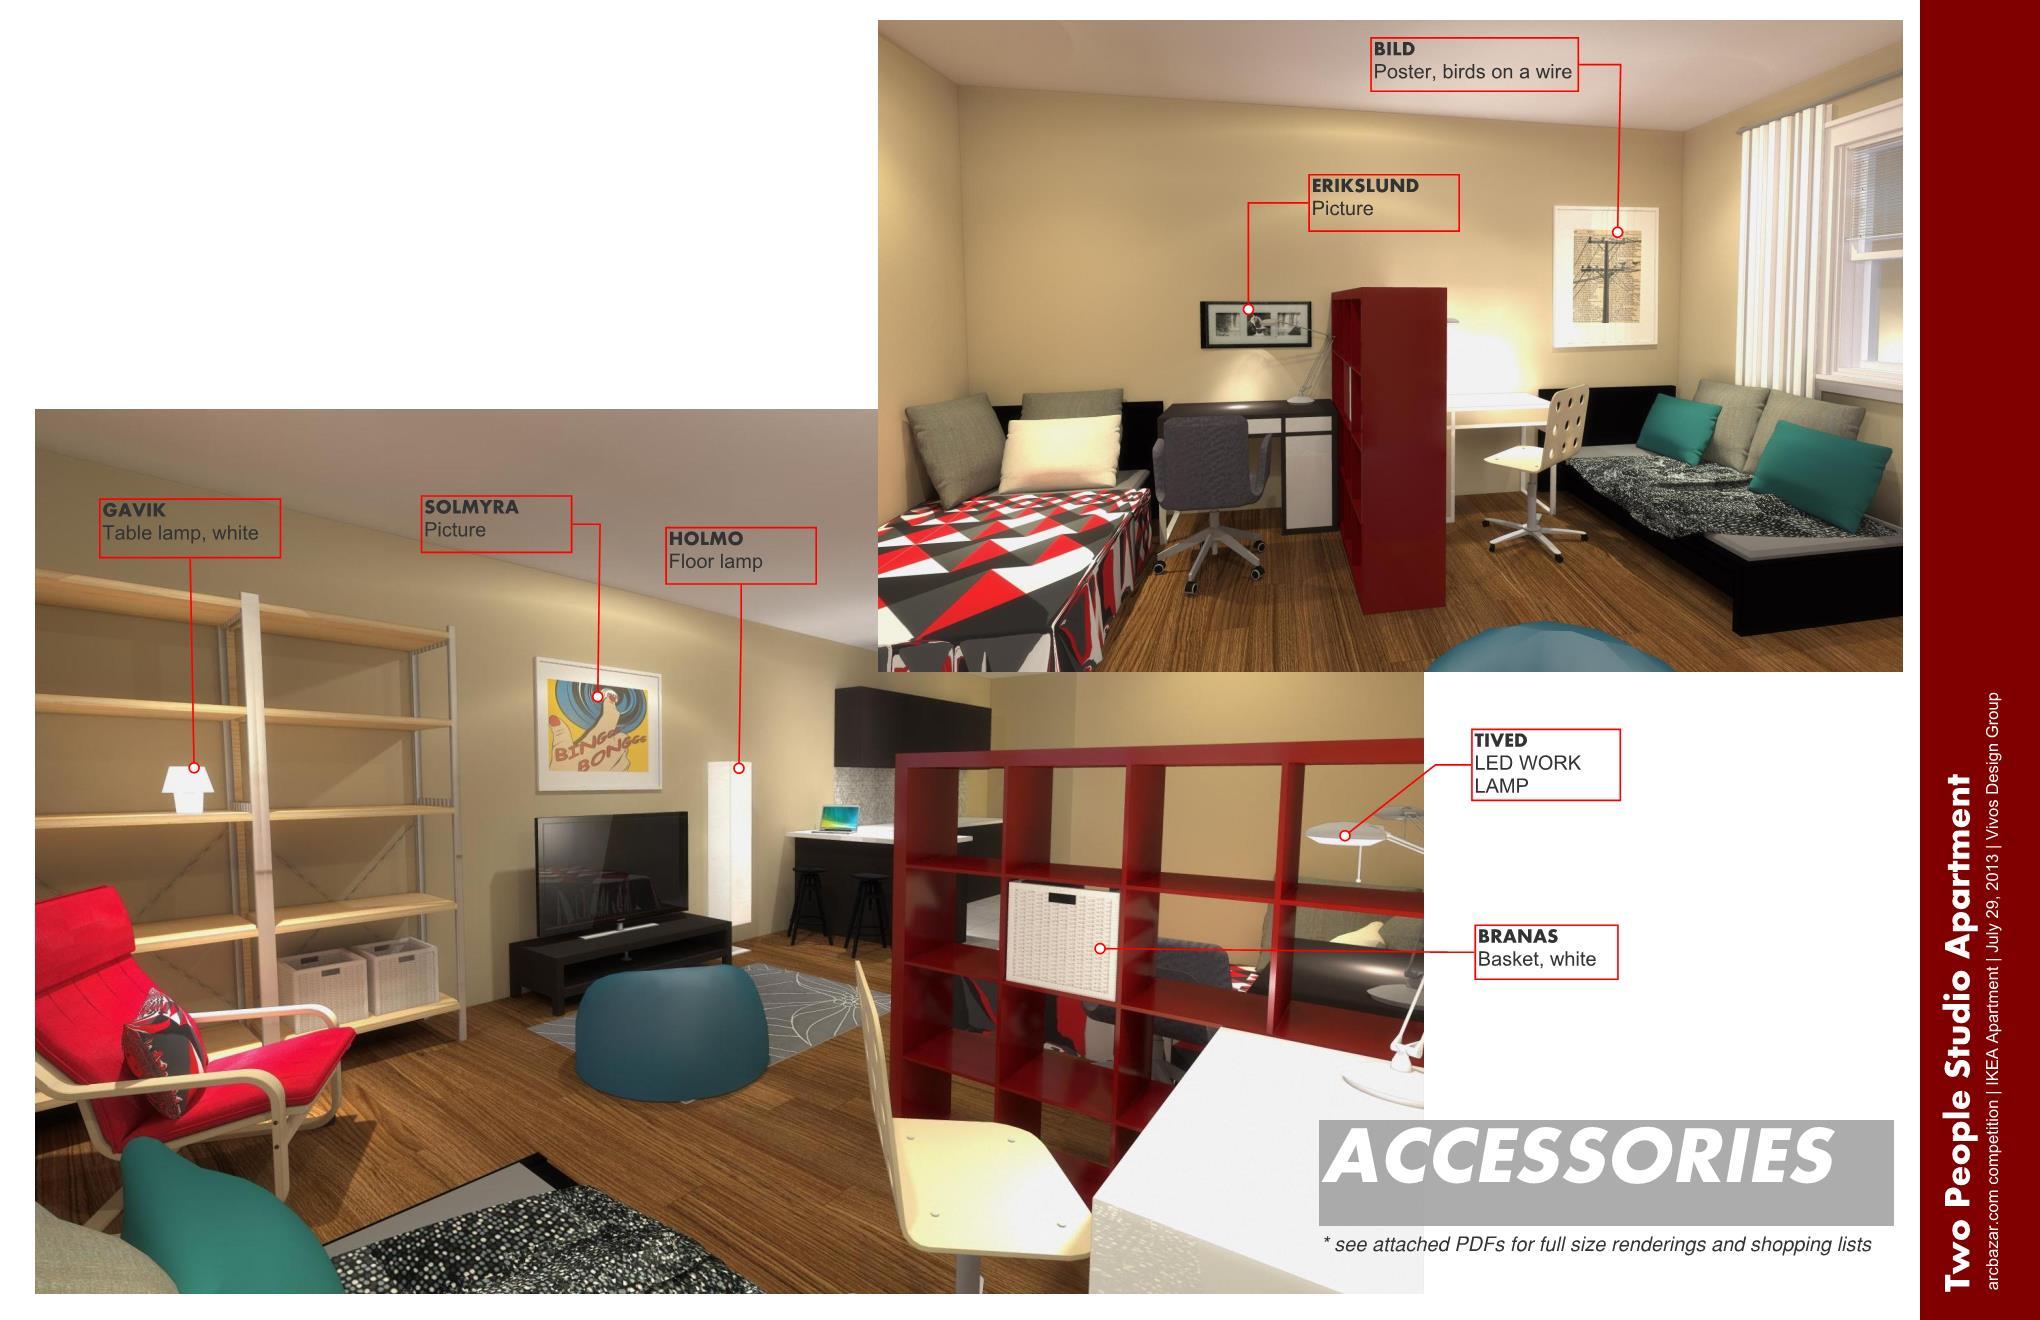 Apartment design designed by vivos design group ikea apartment skillman us arcbazar - Studio apartment design ideas ikea ...